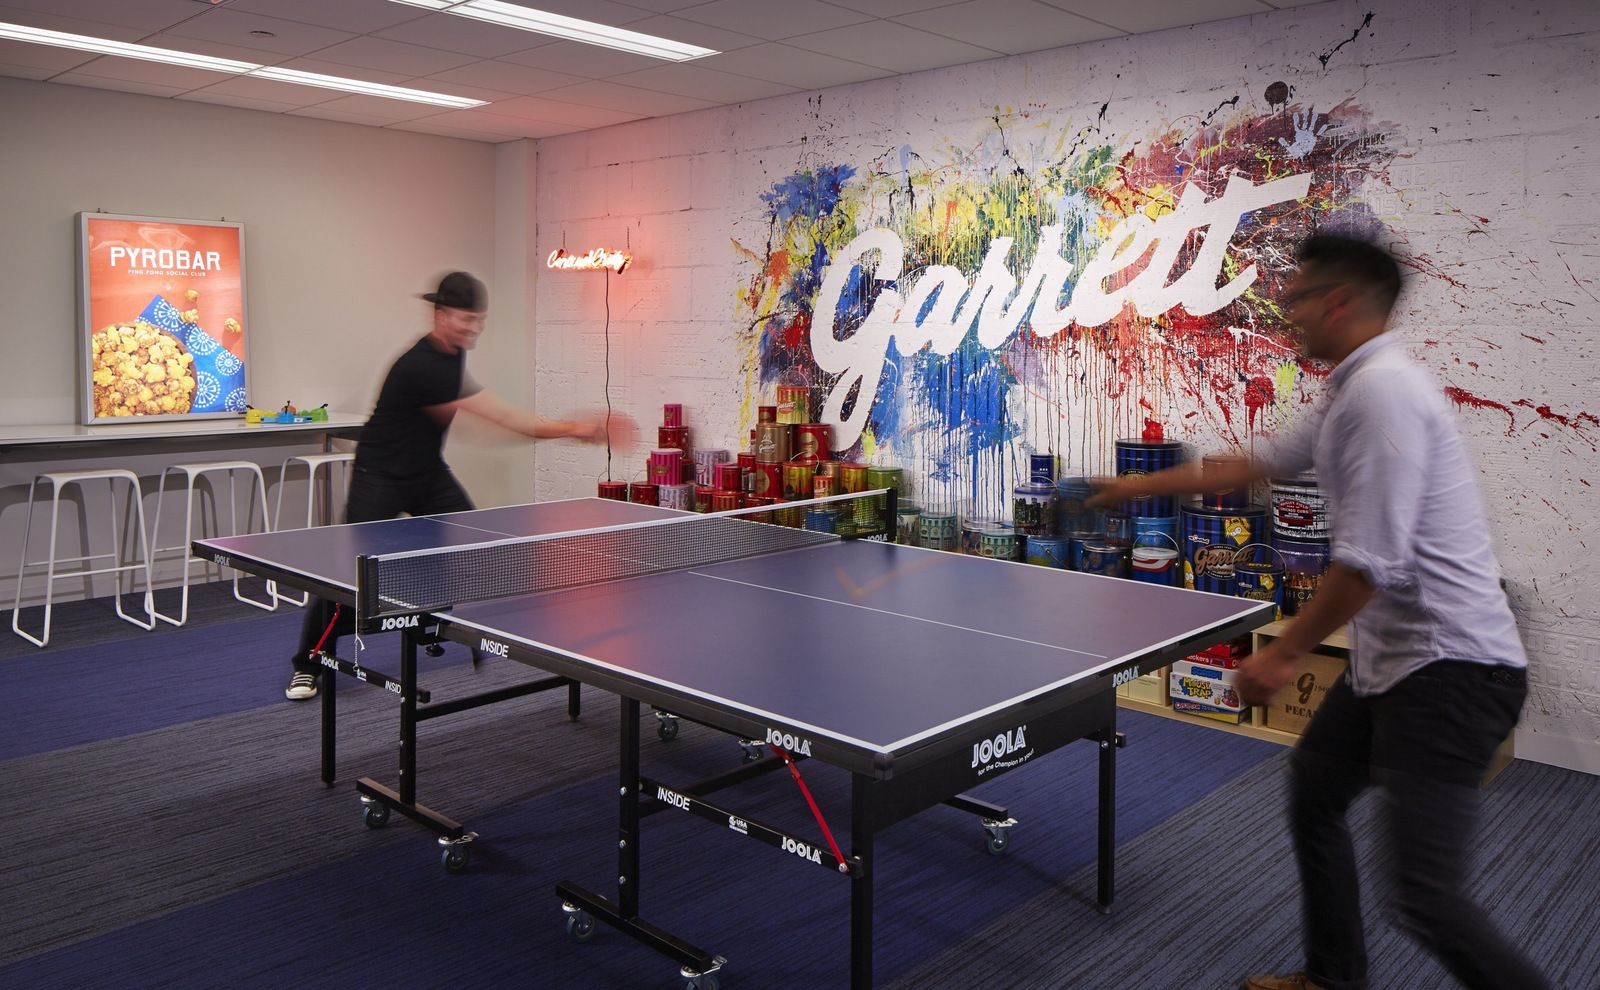 Garrett Brands Hed Ping Pong Office Snapshots Office Games Office Break Room Ping Pong